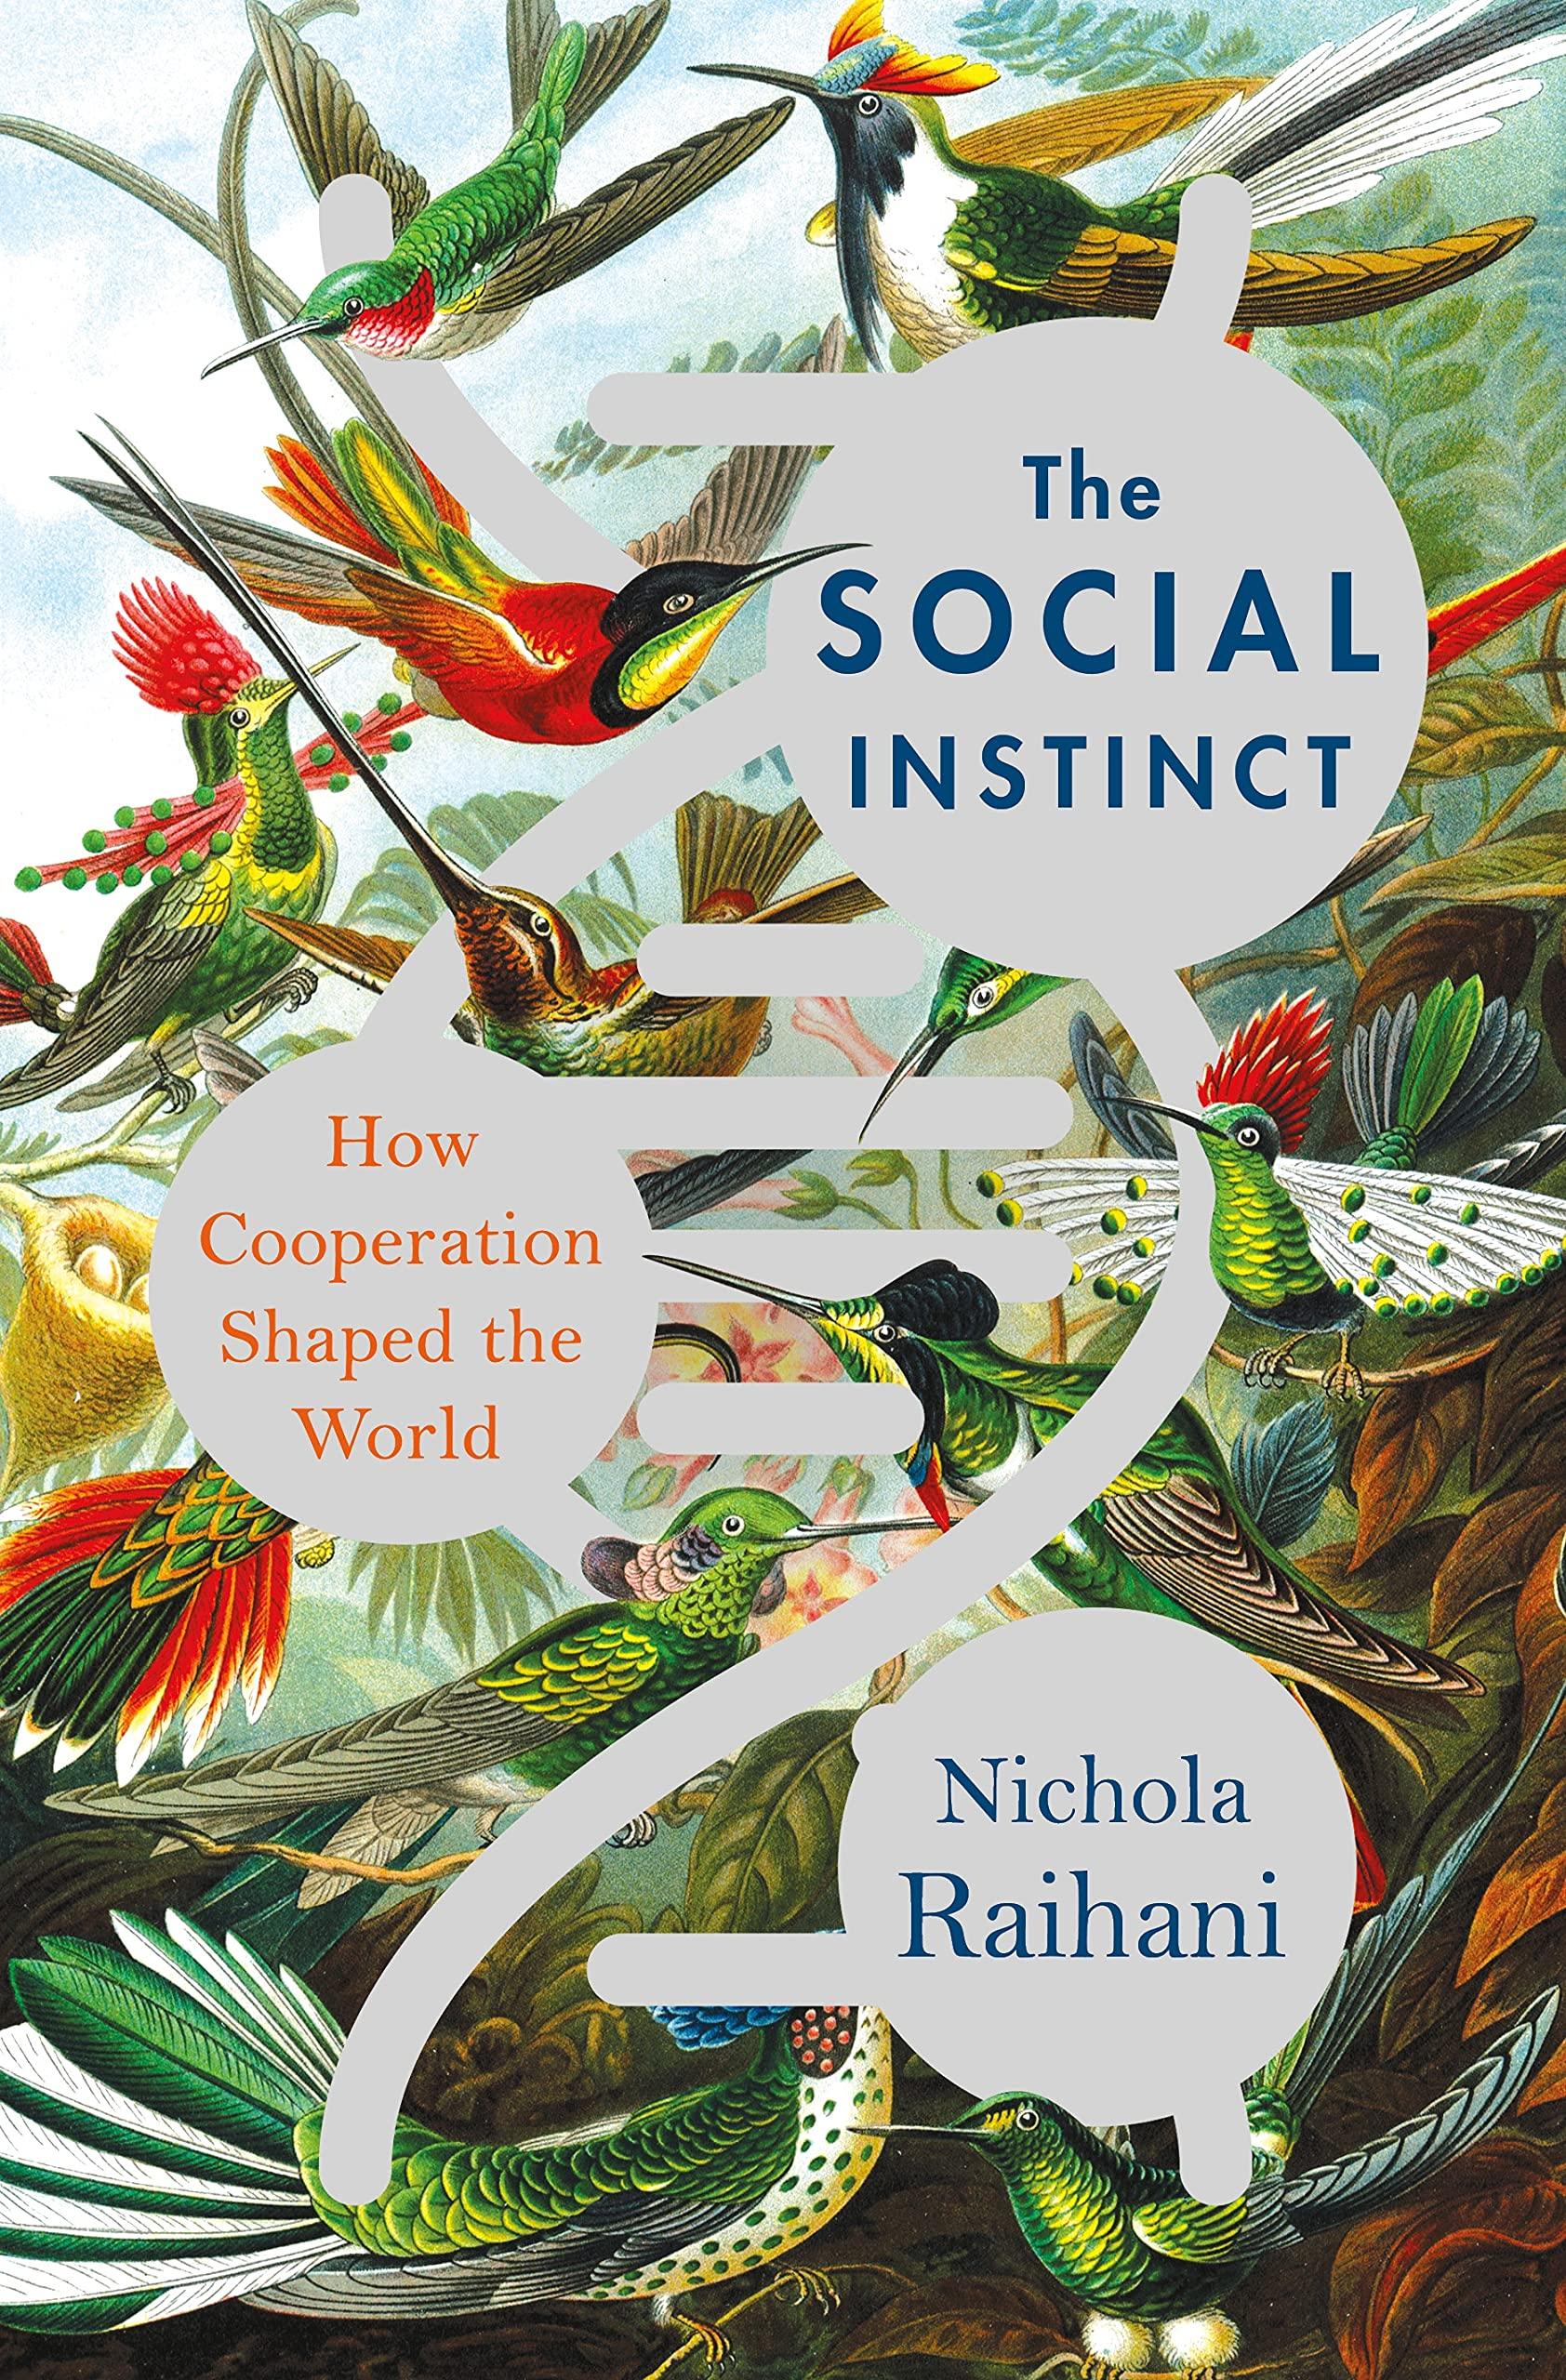 Nicola Raihani The Social Instinct.